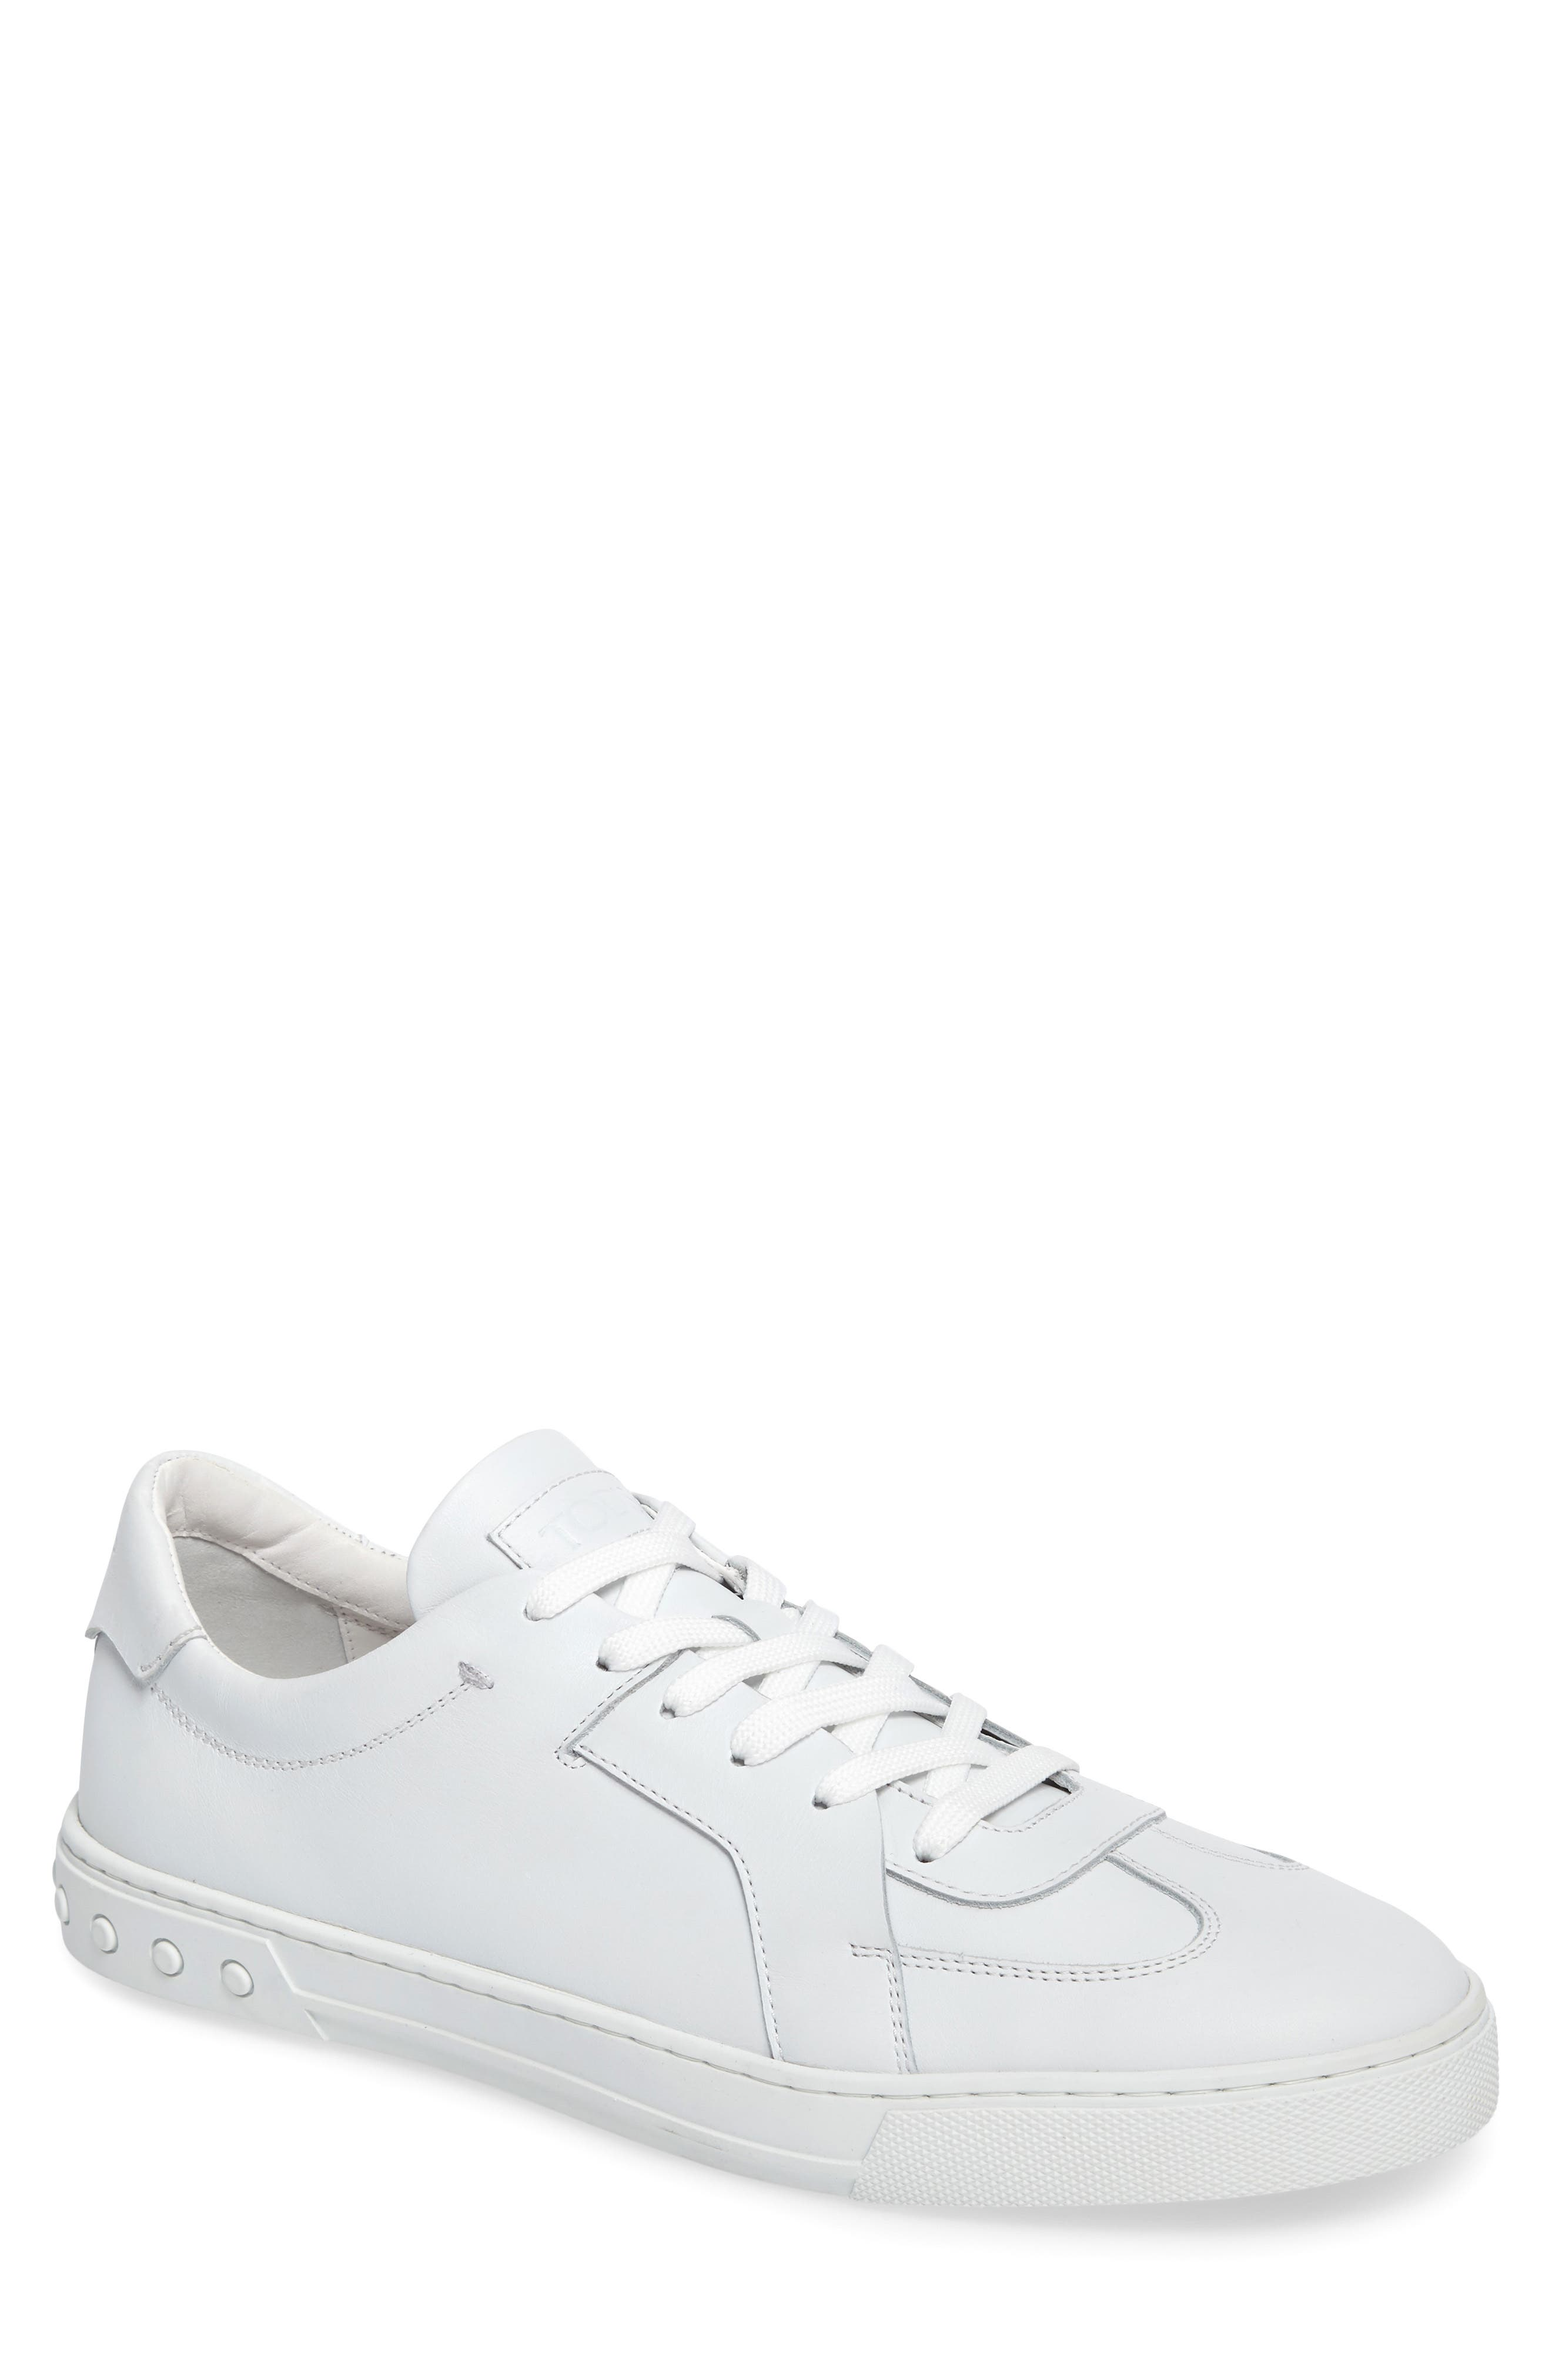 Main Image - Tod's Cassetta Leather Sneaker (Men)